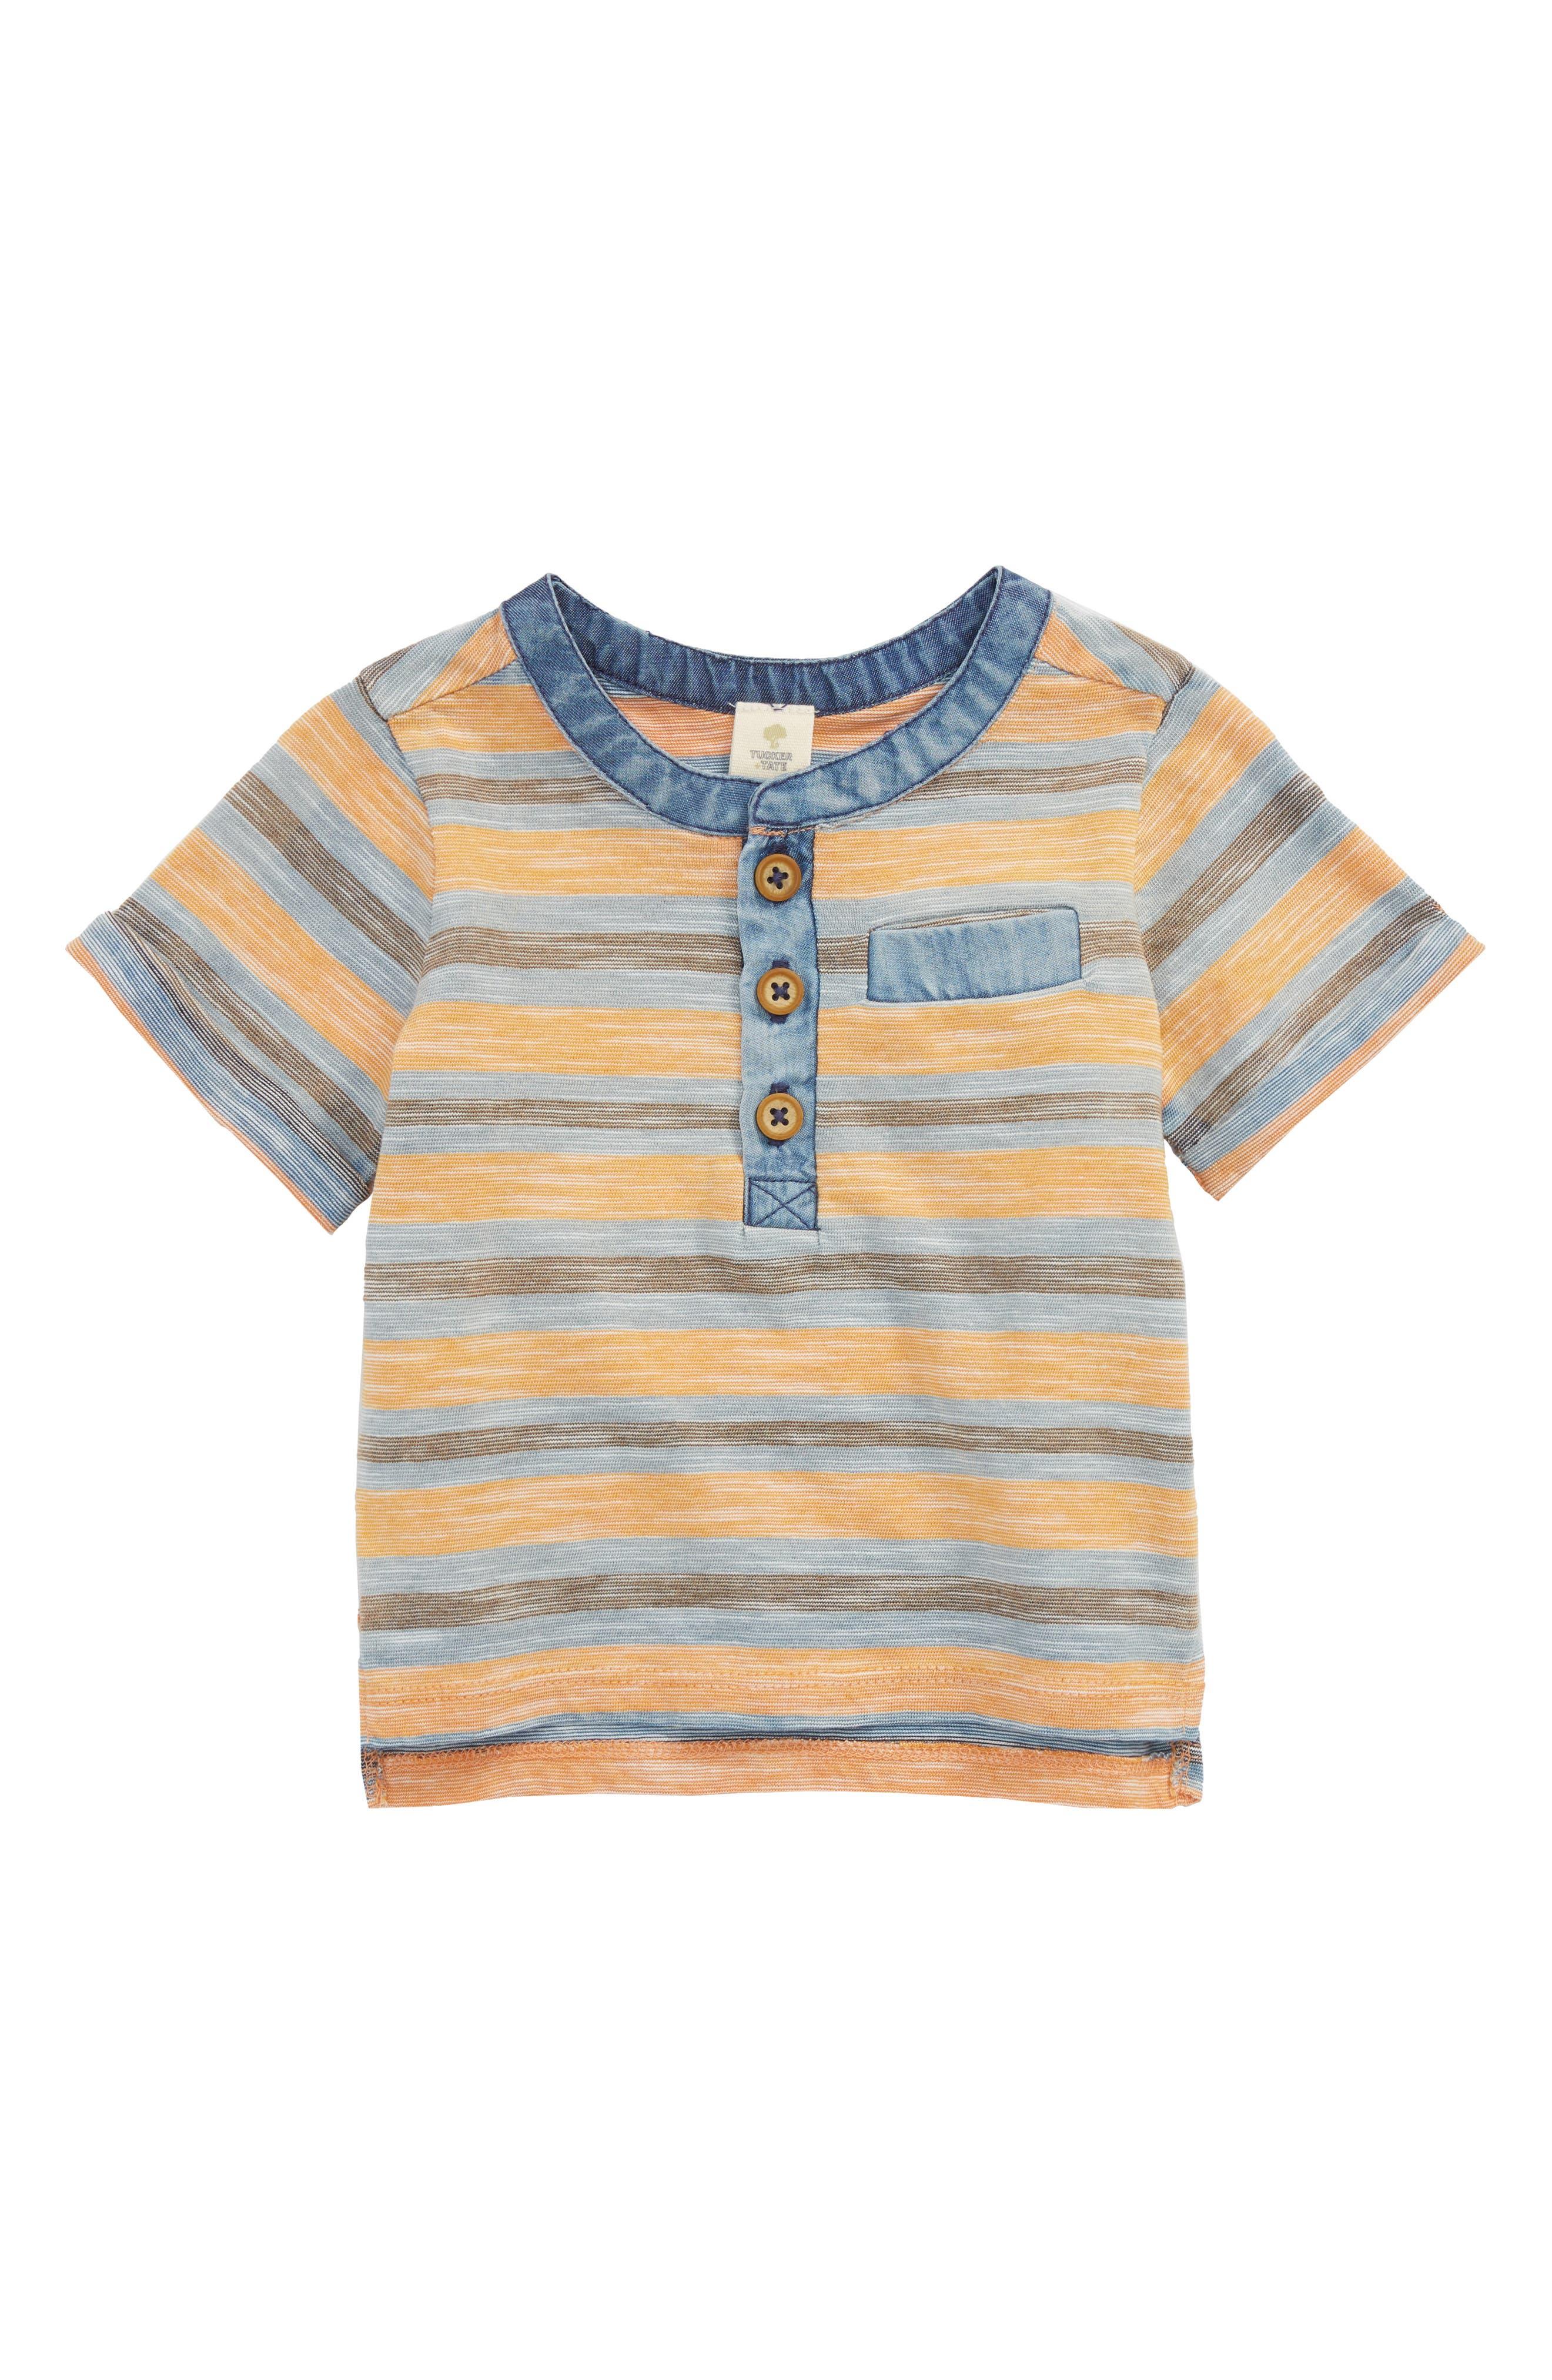 Reverse Stripe Henley,                             Main thumbnail 1, color,                             Orange Glaze- Blue Stripe